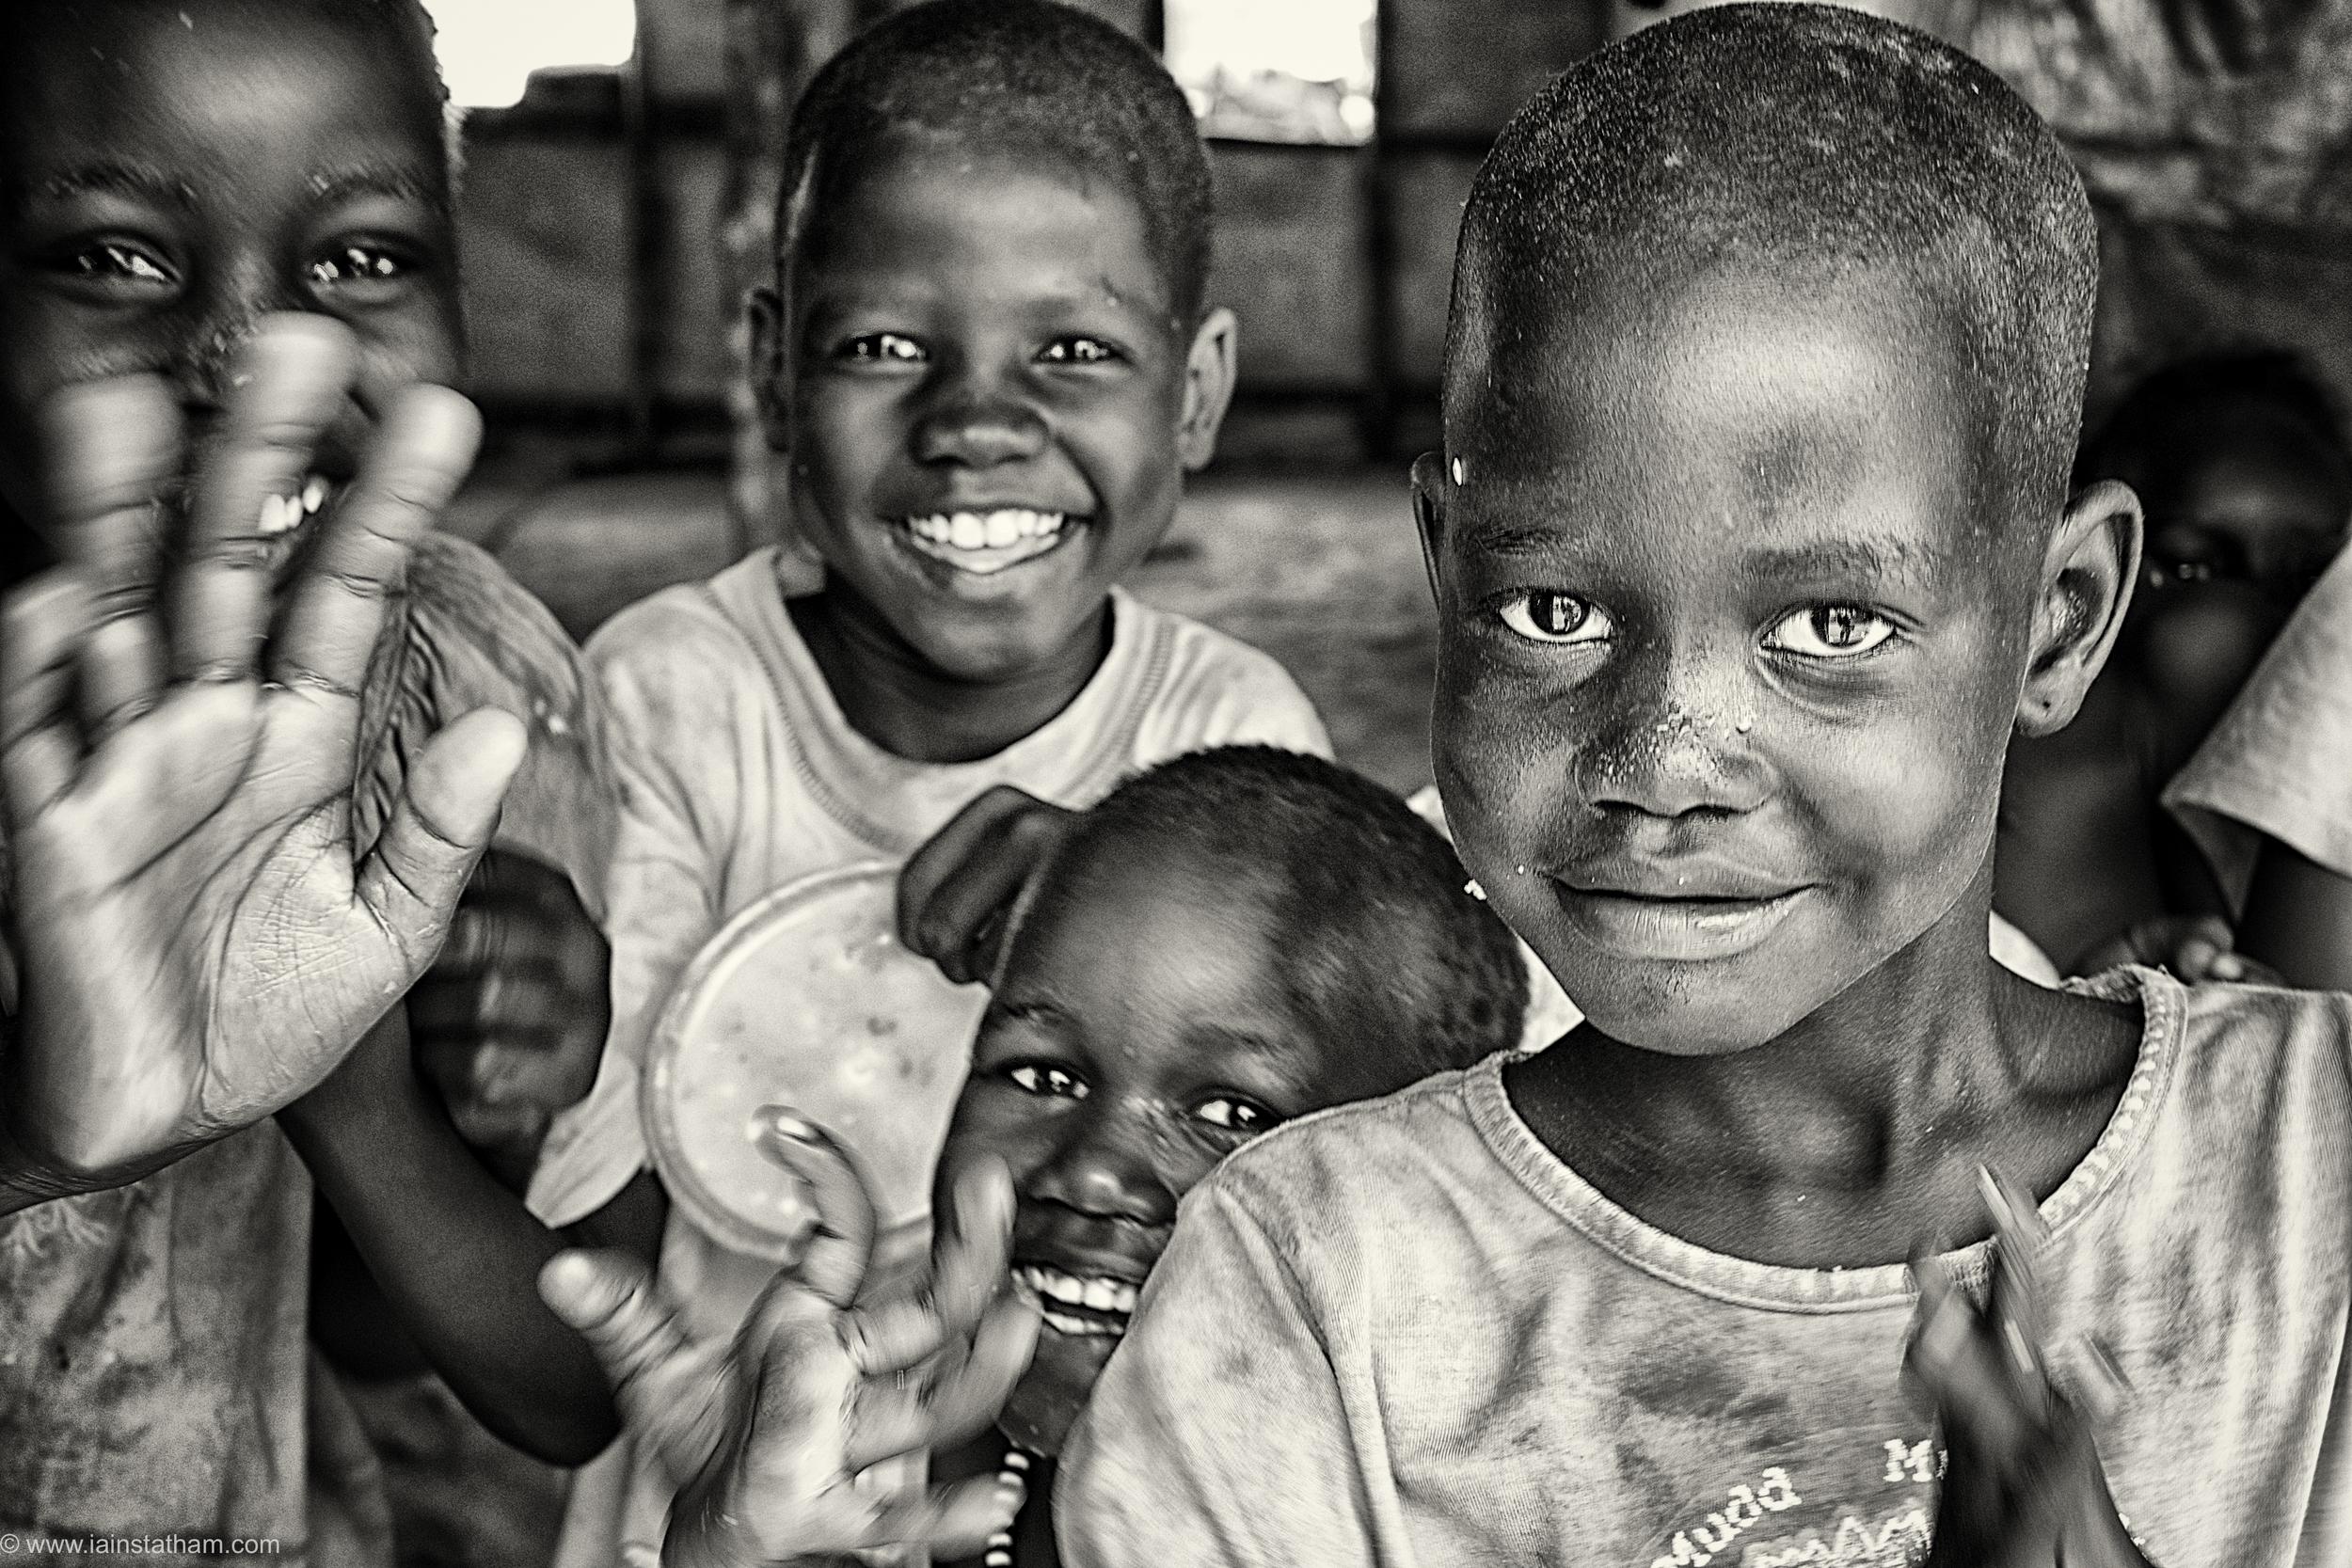 ug - south sudan refugees - dziapi - bw-20.jpg